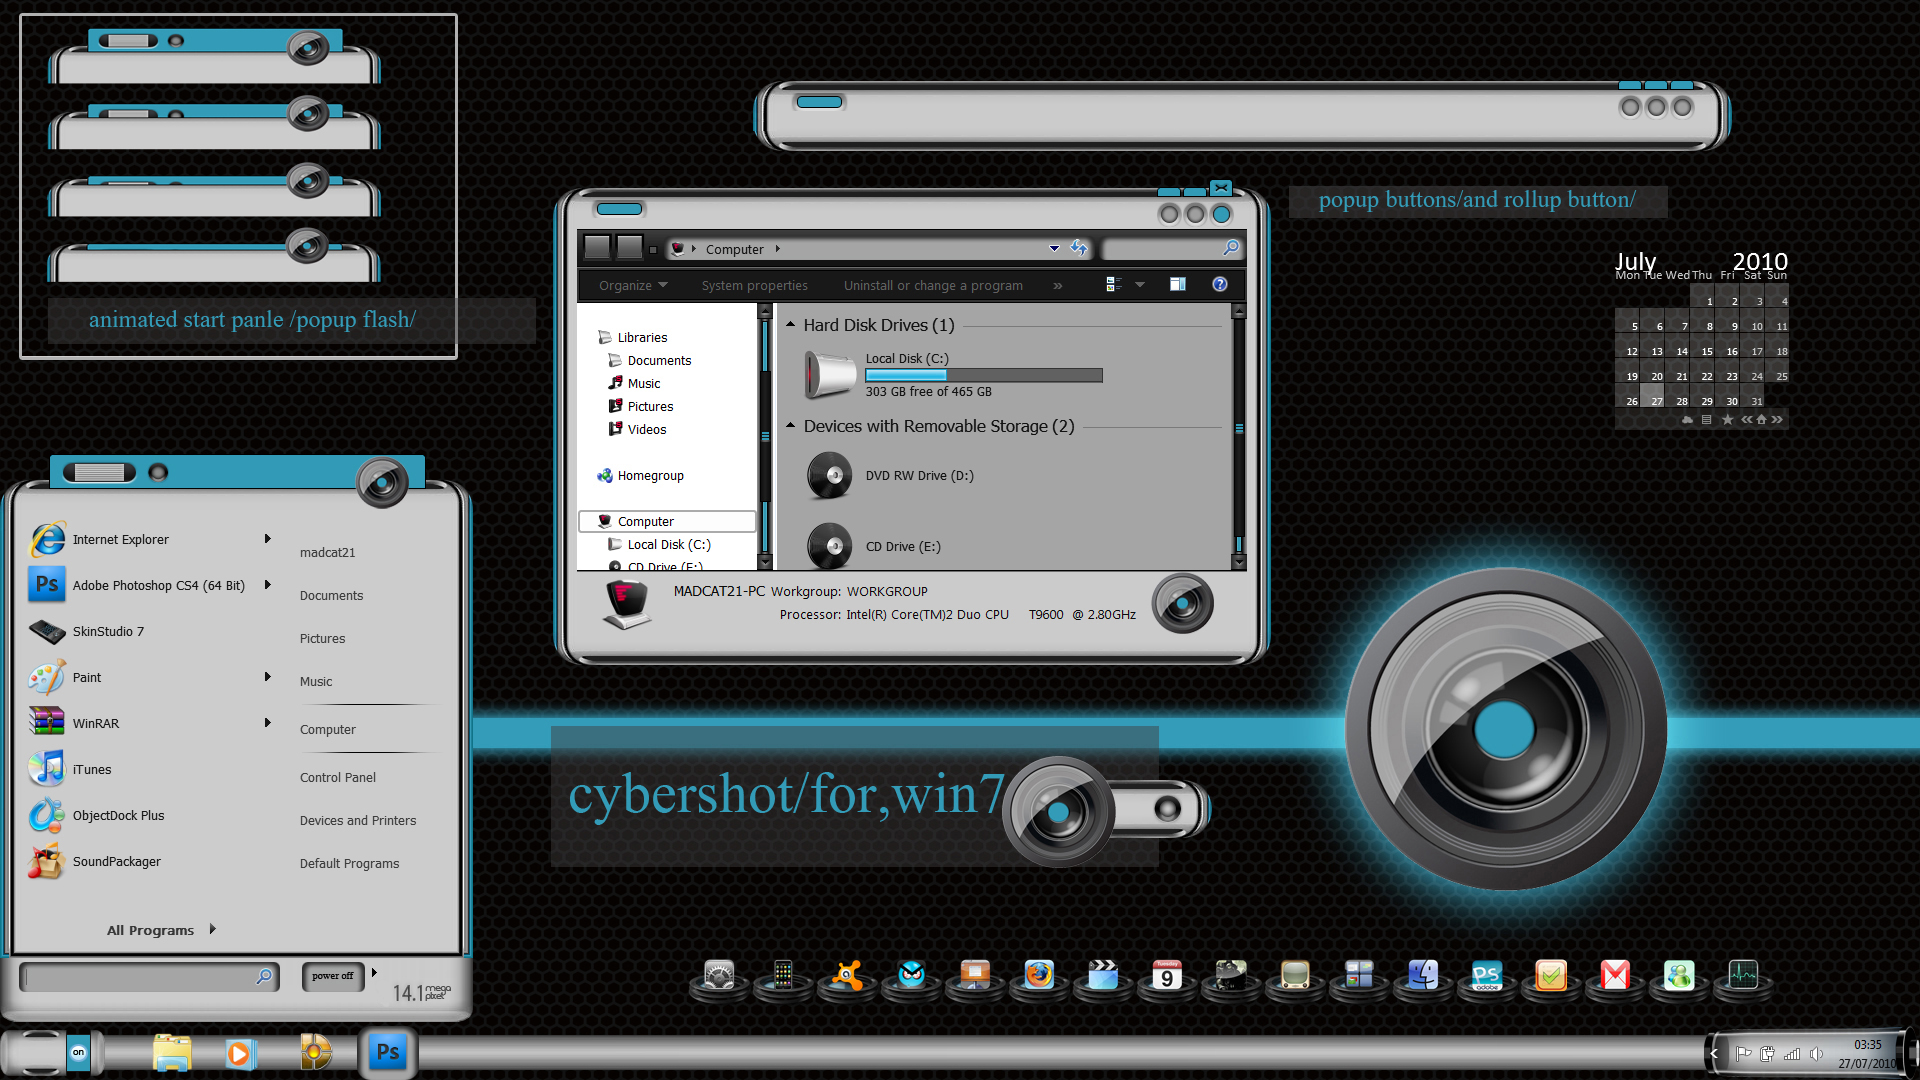 cybershot wb